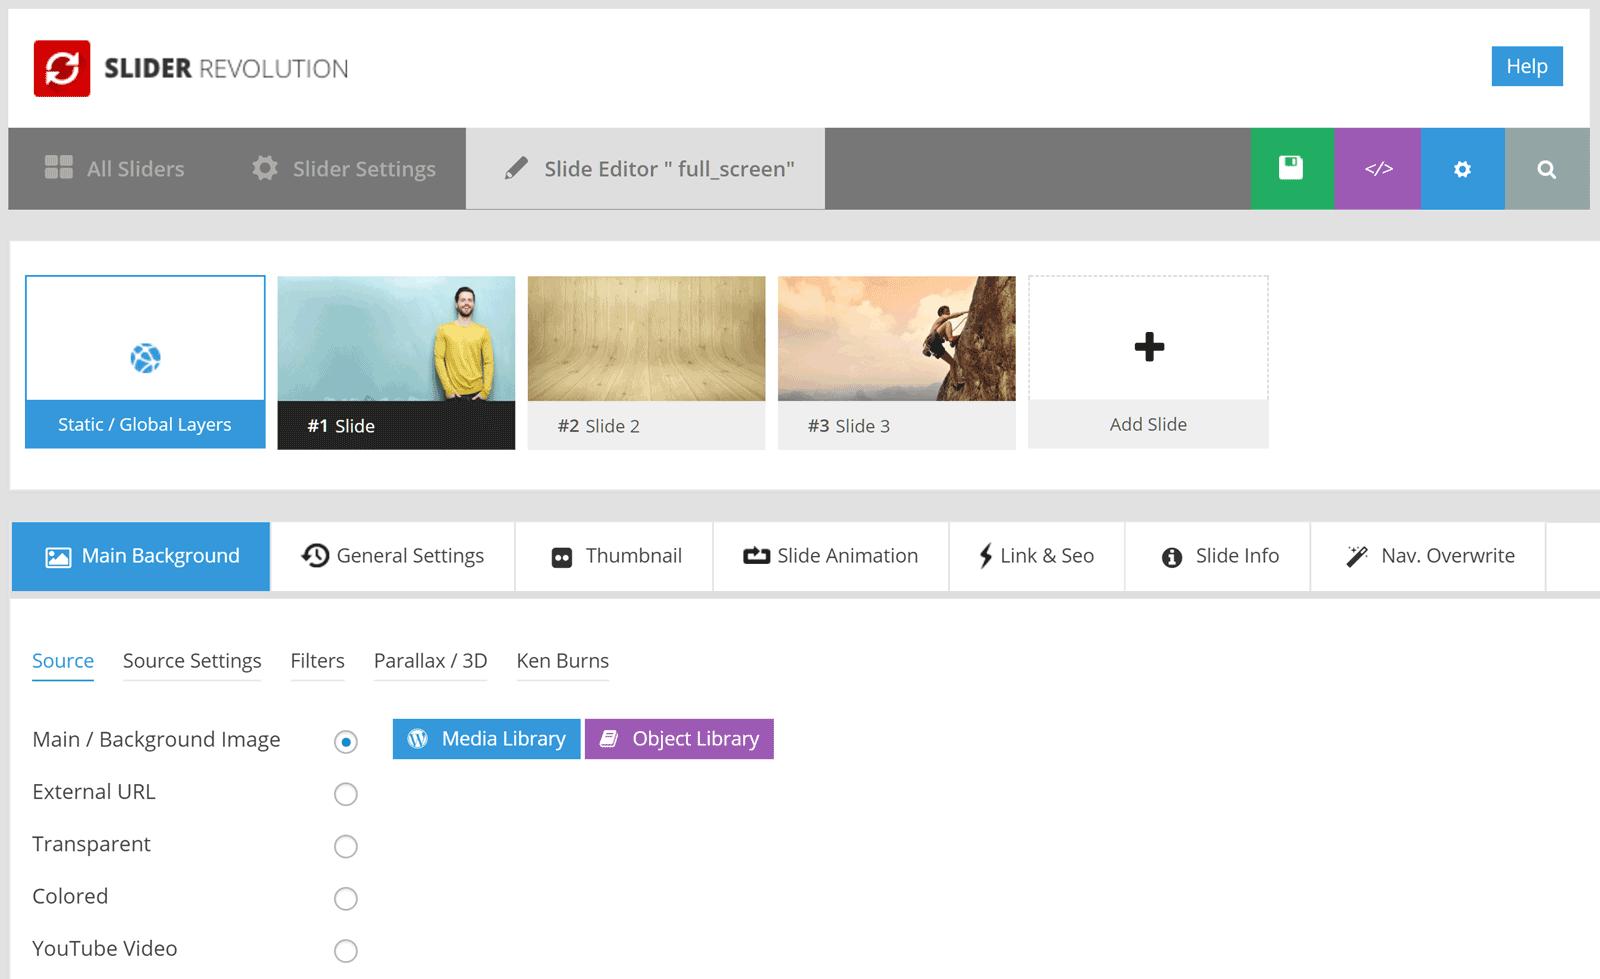 Slider Revolution UI